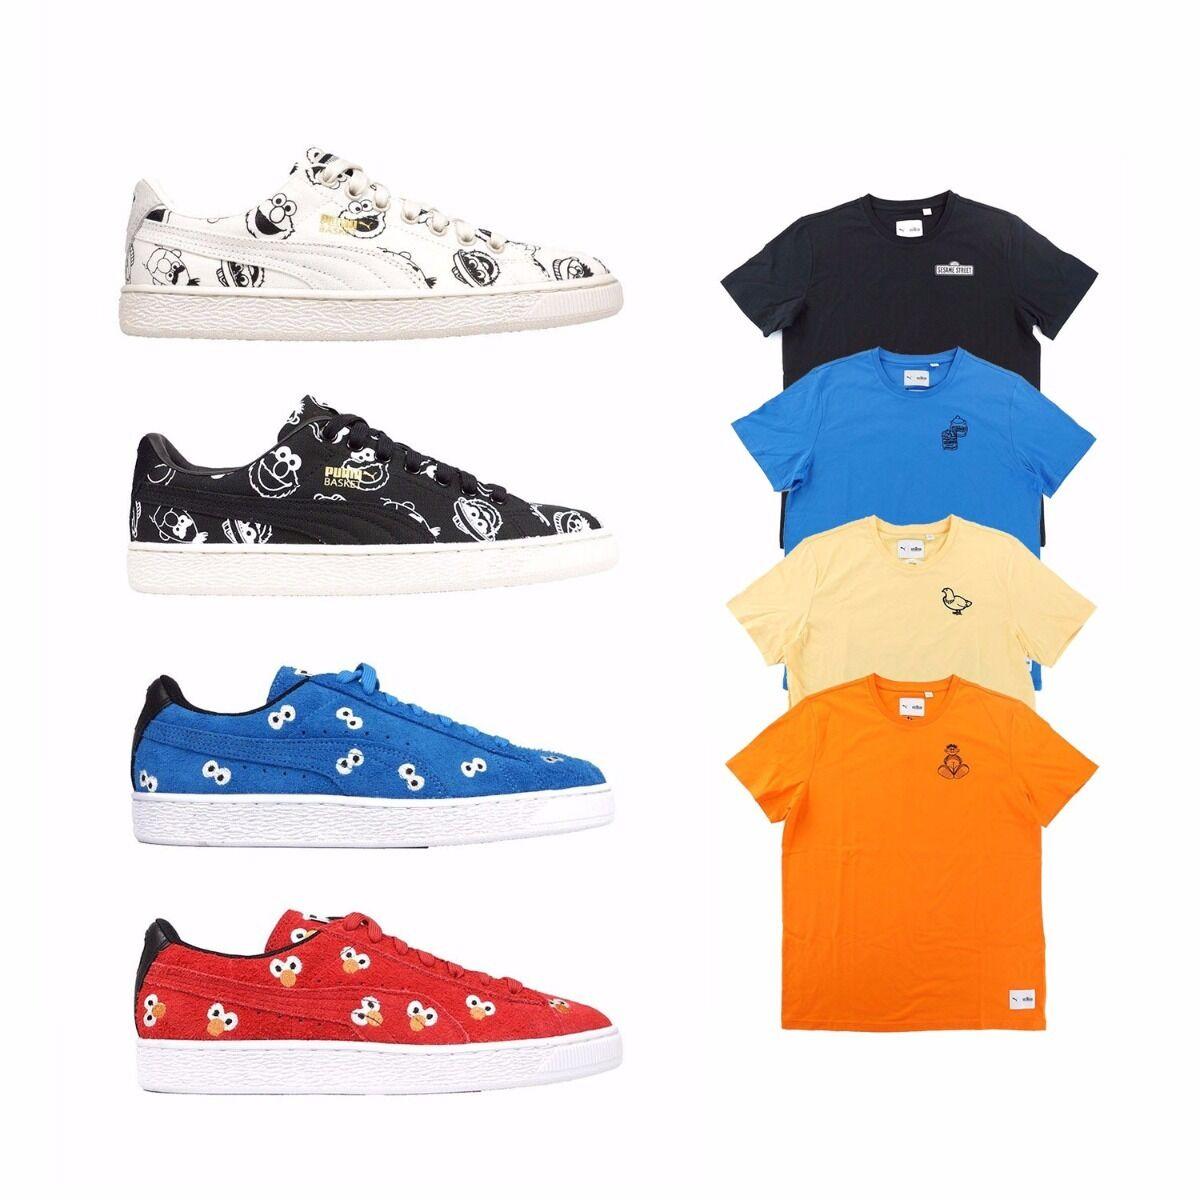 363220 363269 Puma x Sesame Street Suede Street Basket Men's Shoes T-Shirt